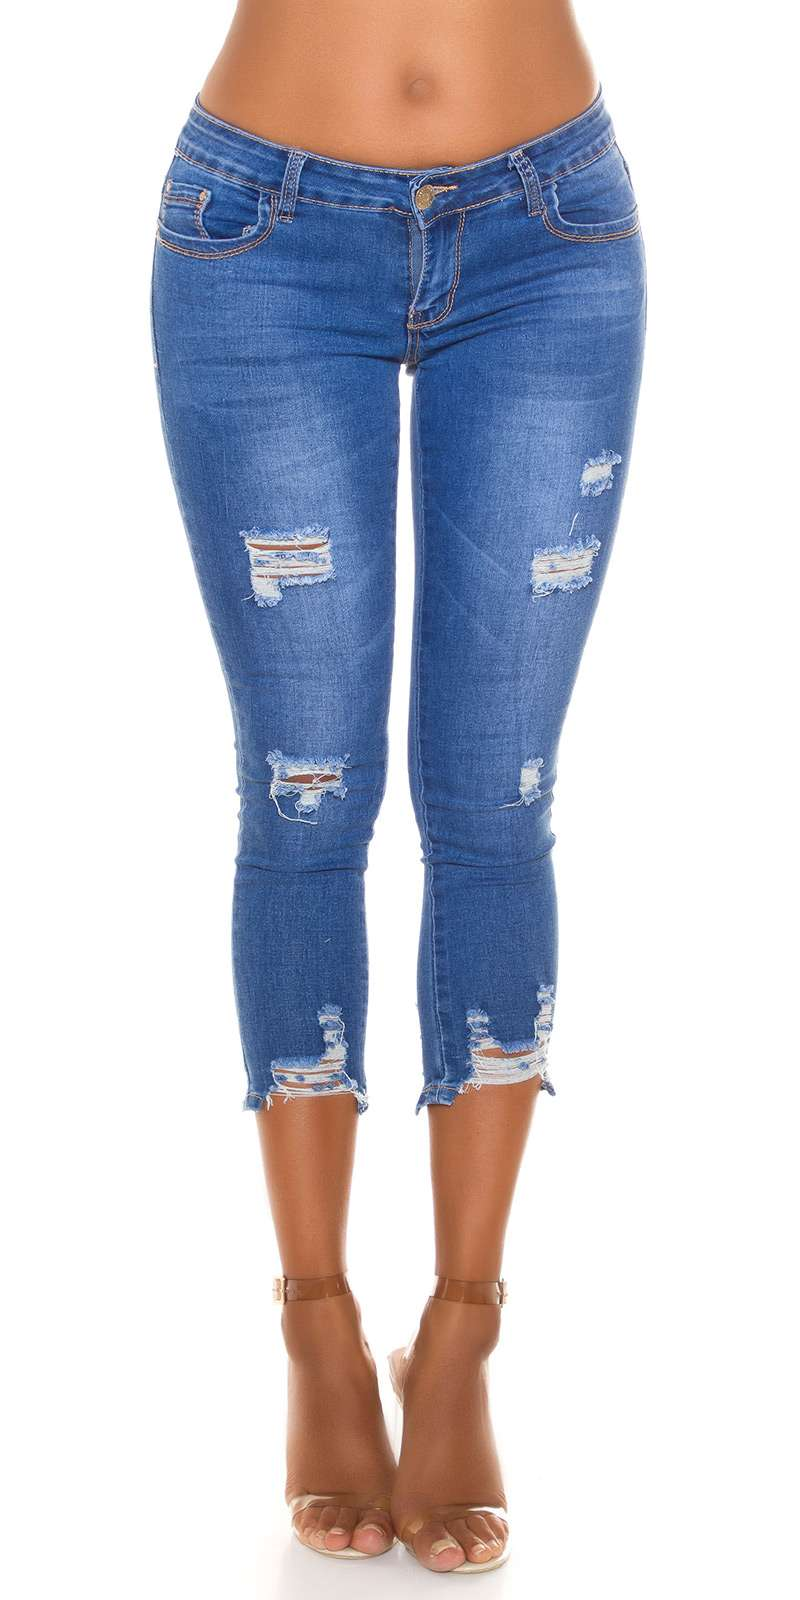 Slim Fit 7/8 Jeans